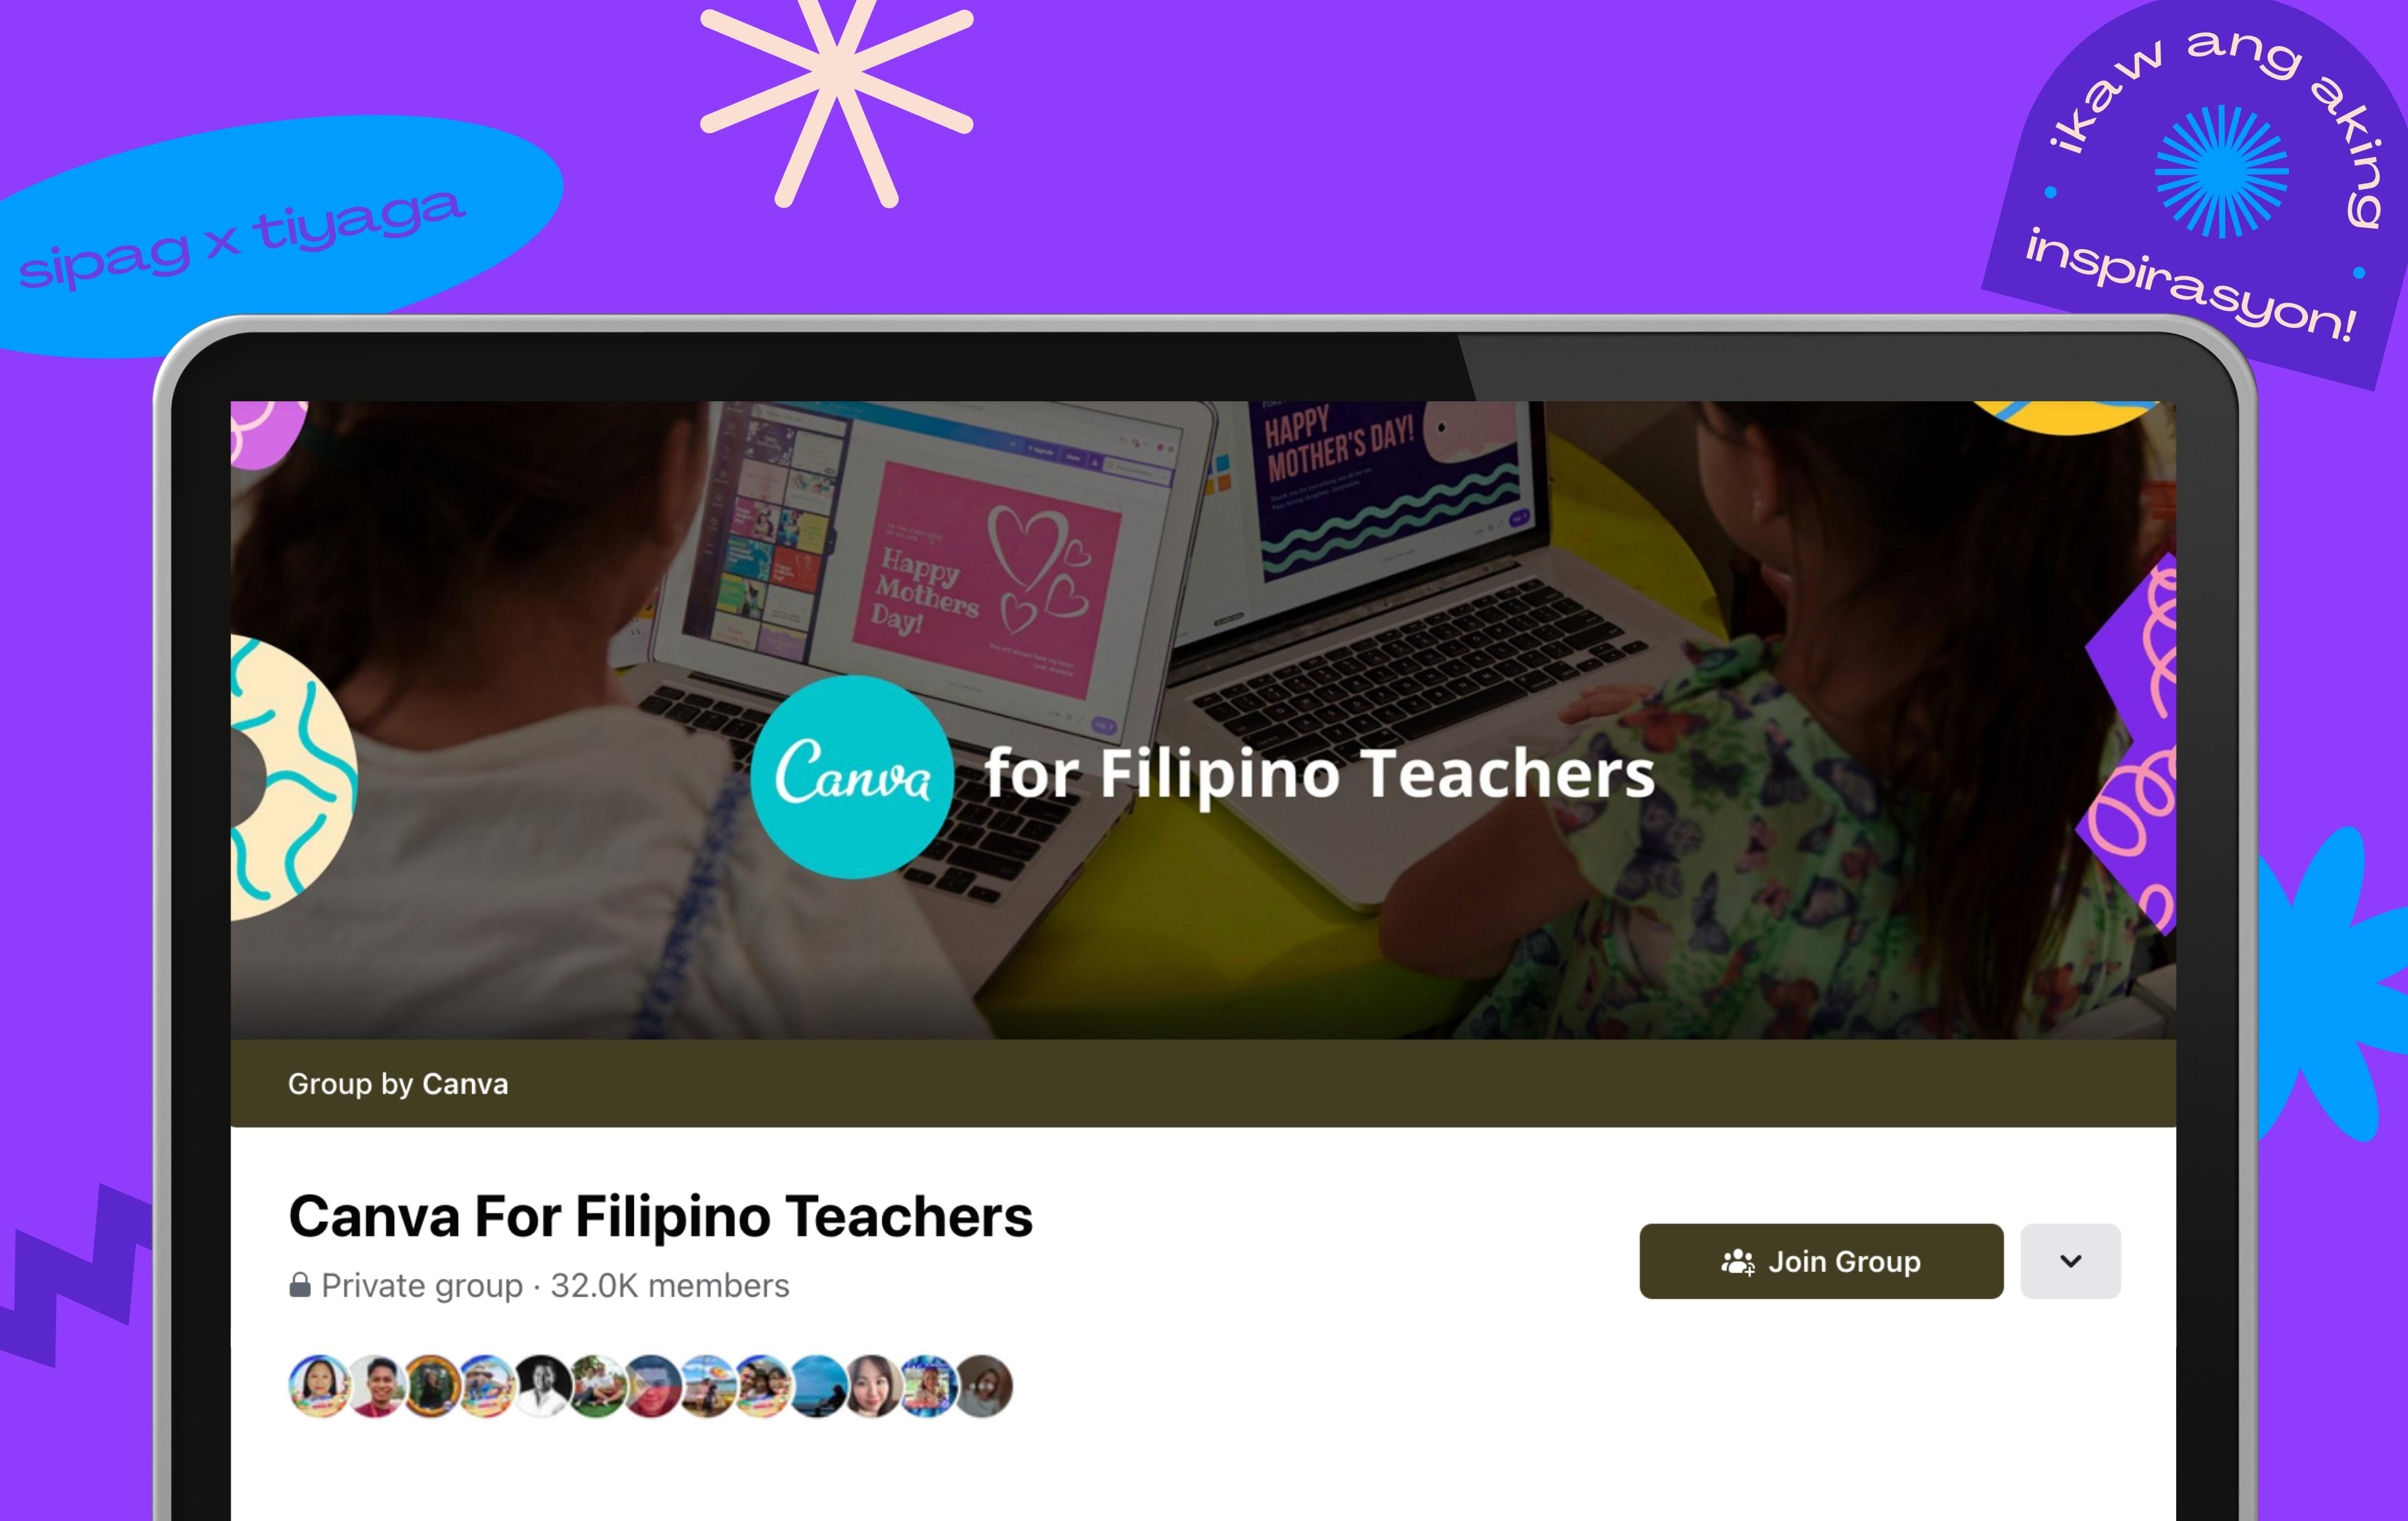 Canva Eskwela - Canva for Filipino Teachers